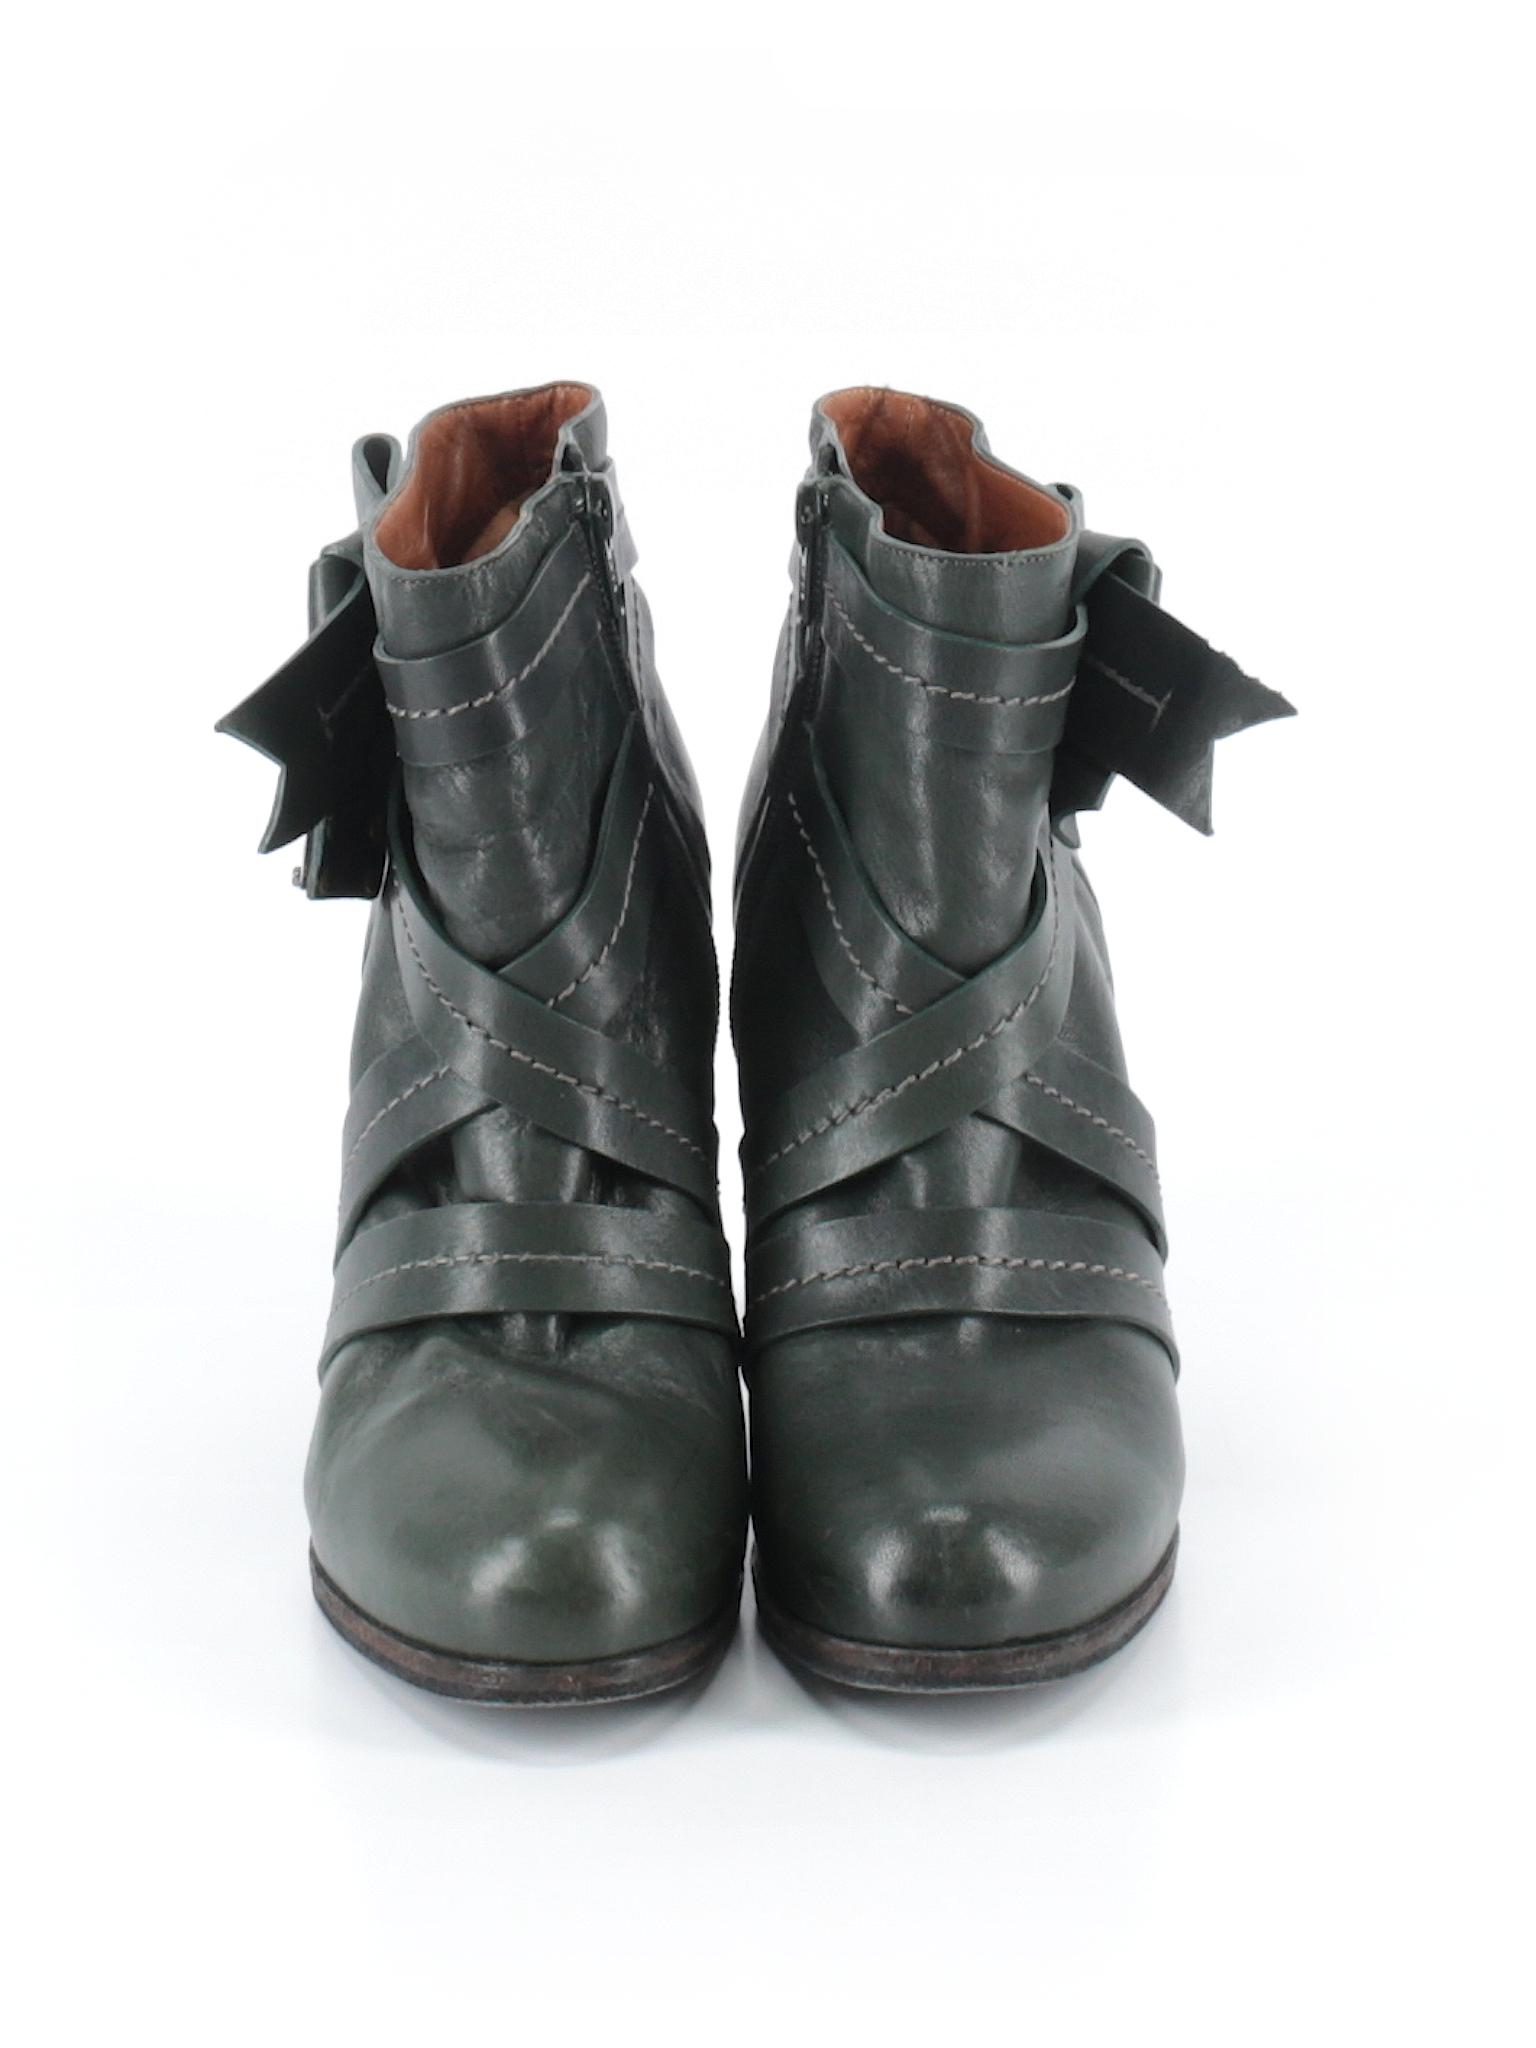 Marc Marc by Ankle Jacobs Boots Boutique promotion w0Eq5A5t